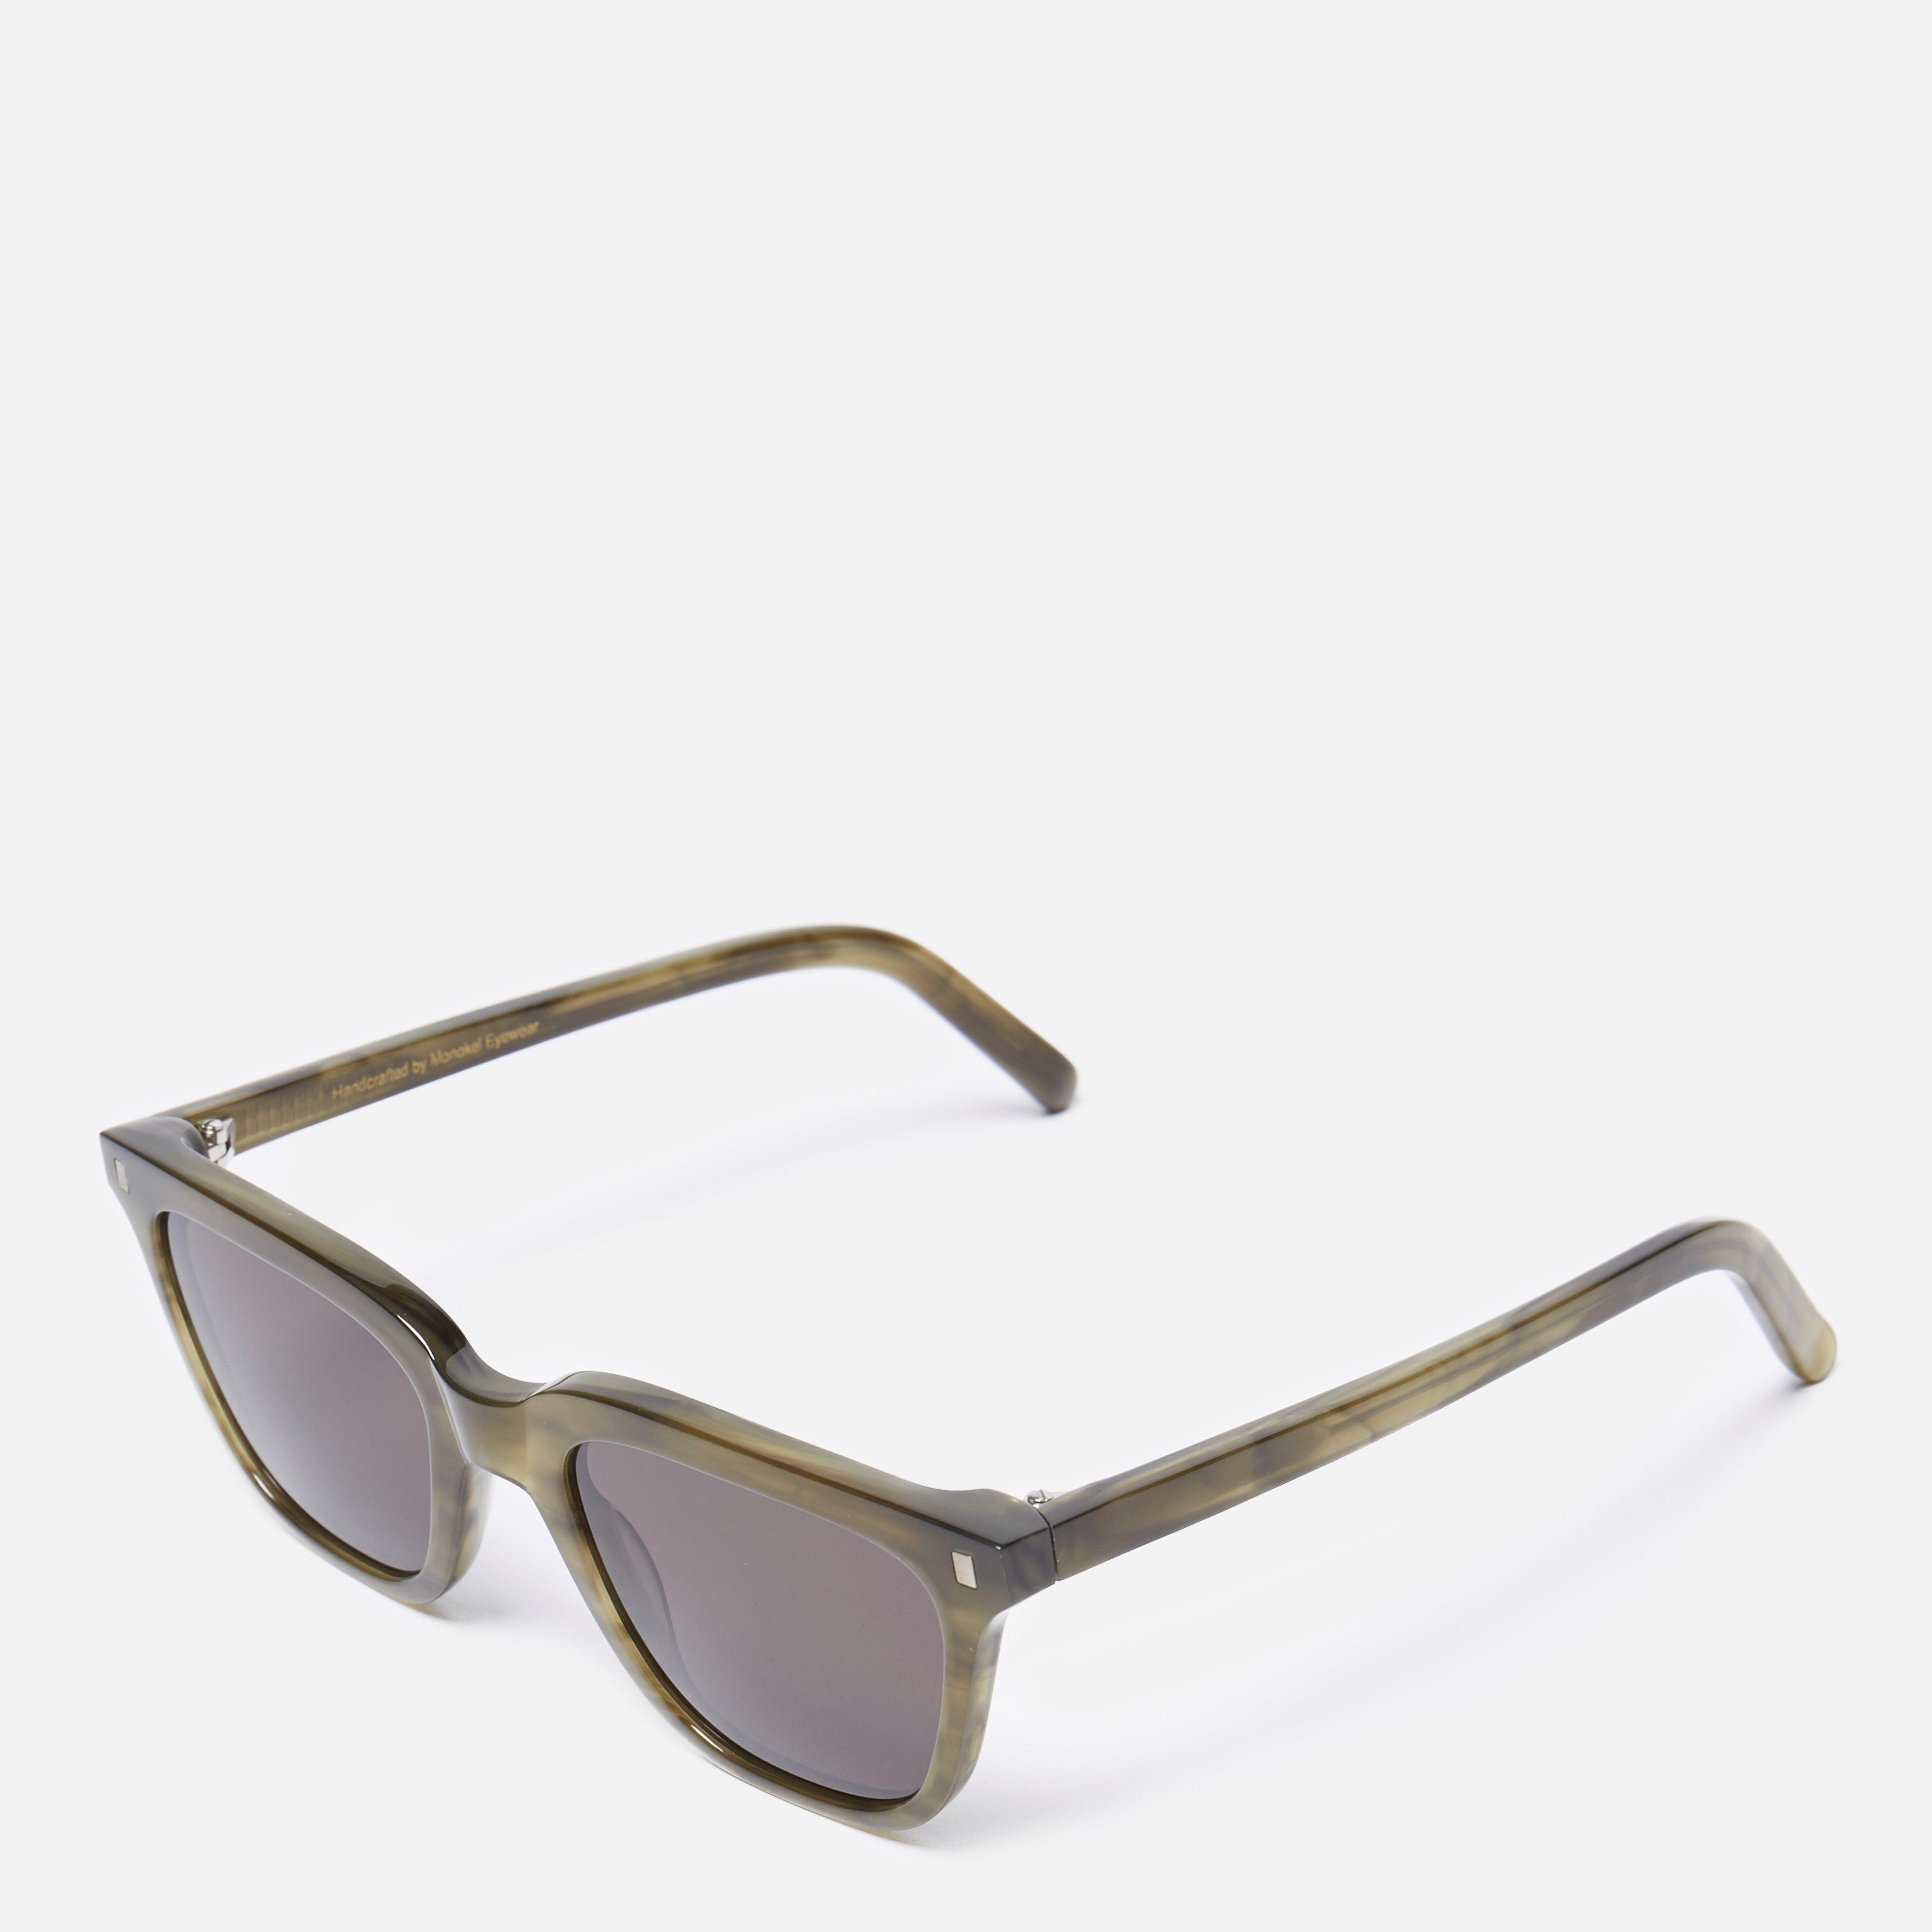 d69c333a07 Monokel Eyewear Robotnik Sunglasses in Green for Men - Lyst